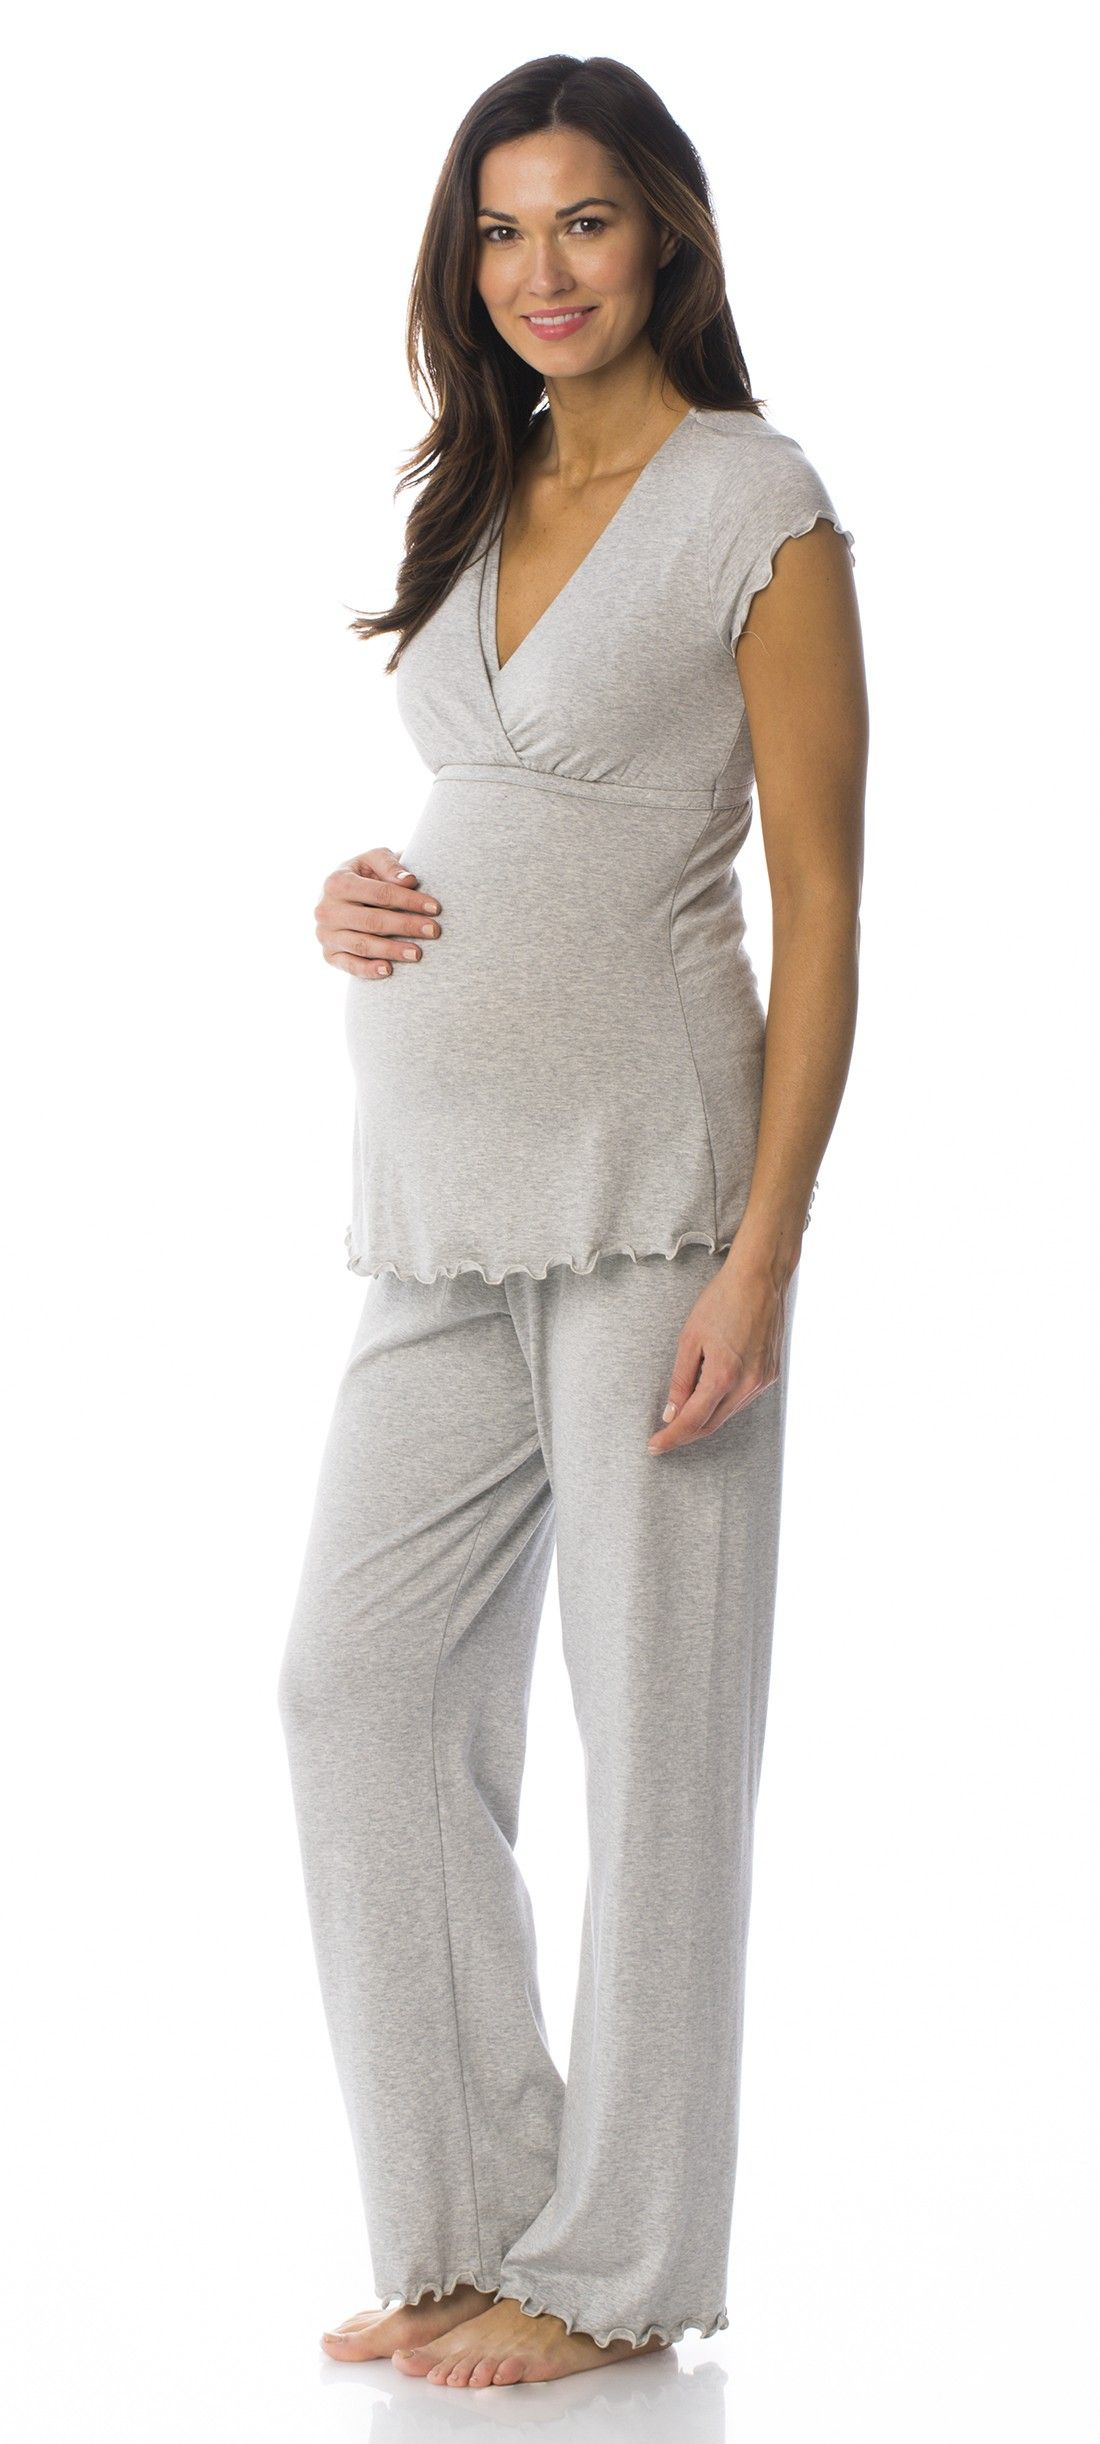 cc8119d3b8938 versatile eco friendly bumpstyle // MAJAMAS // comfy cozy PJs, sleepwear &  pajamas // cotton modal grey maternity top with nursing access for mama &  long ...